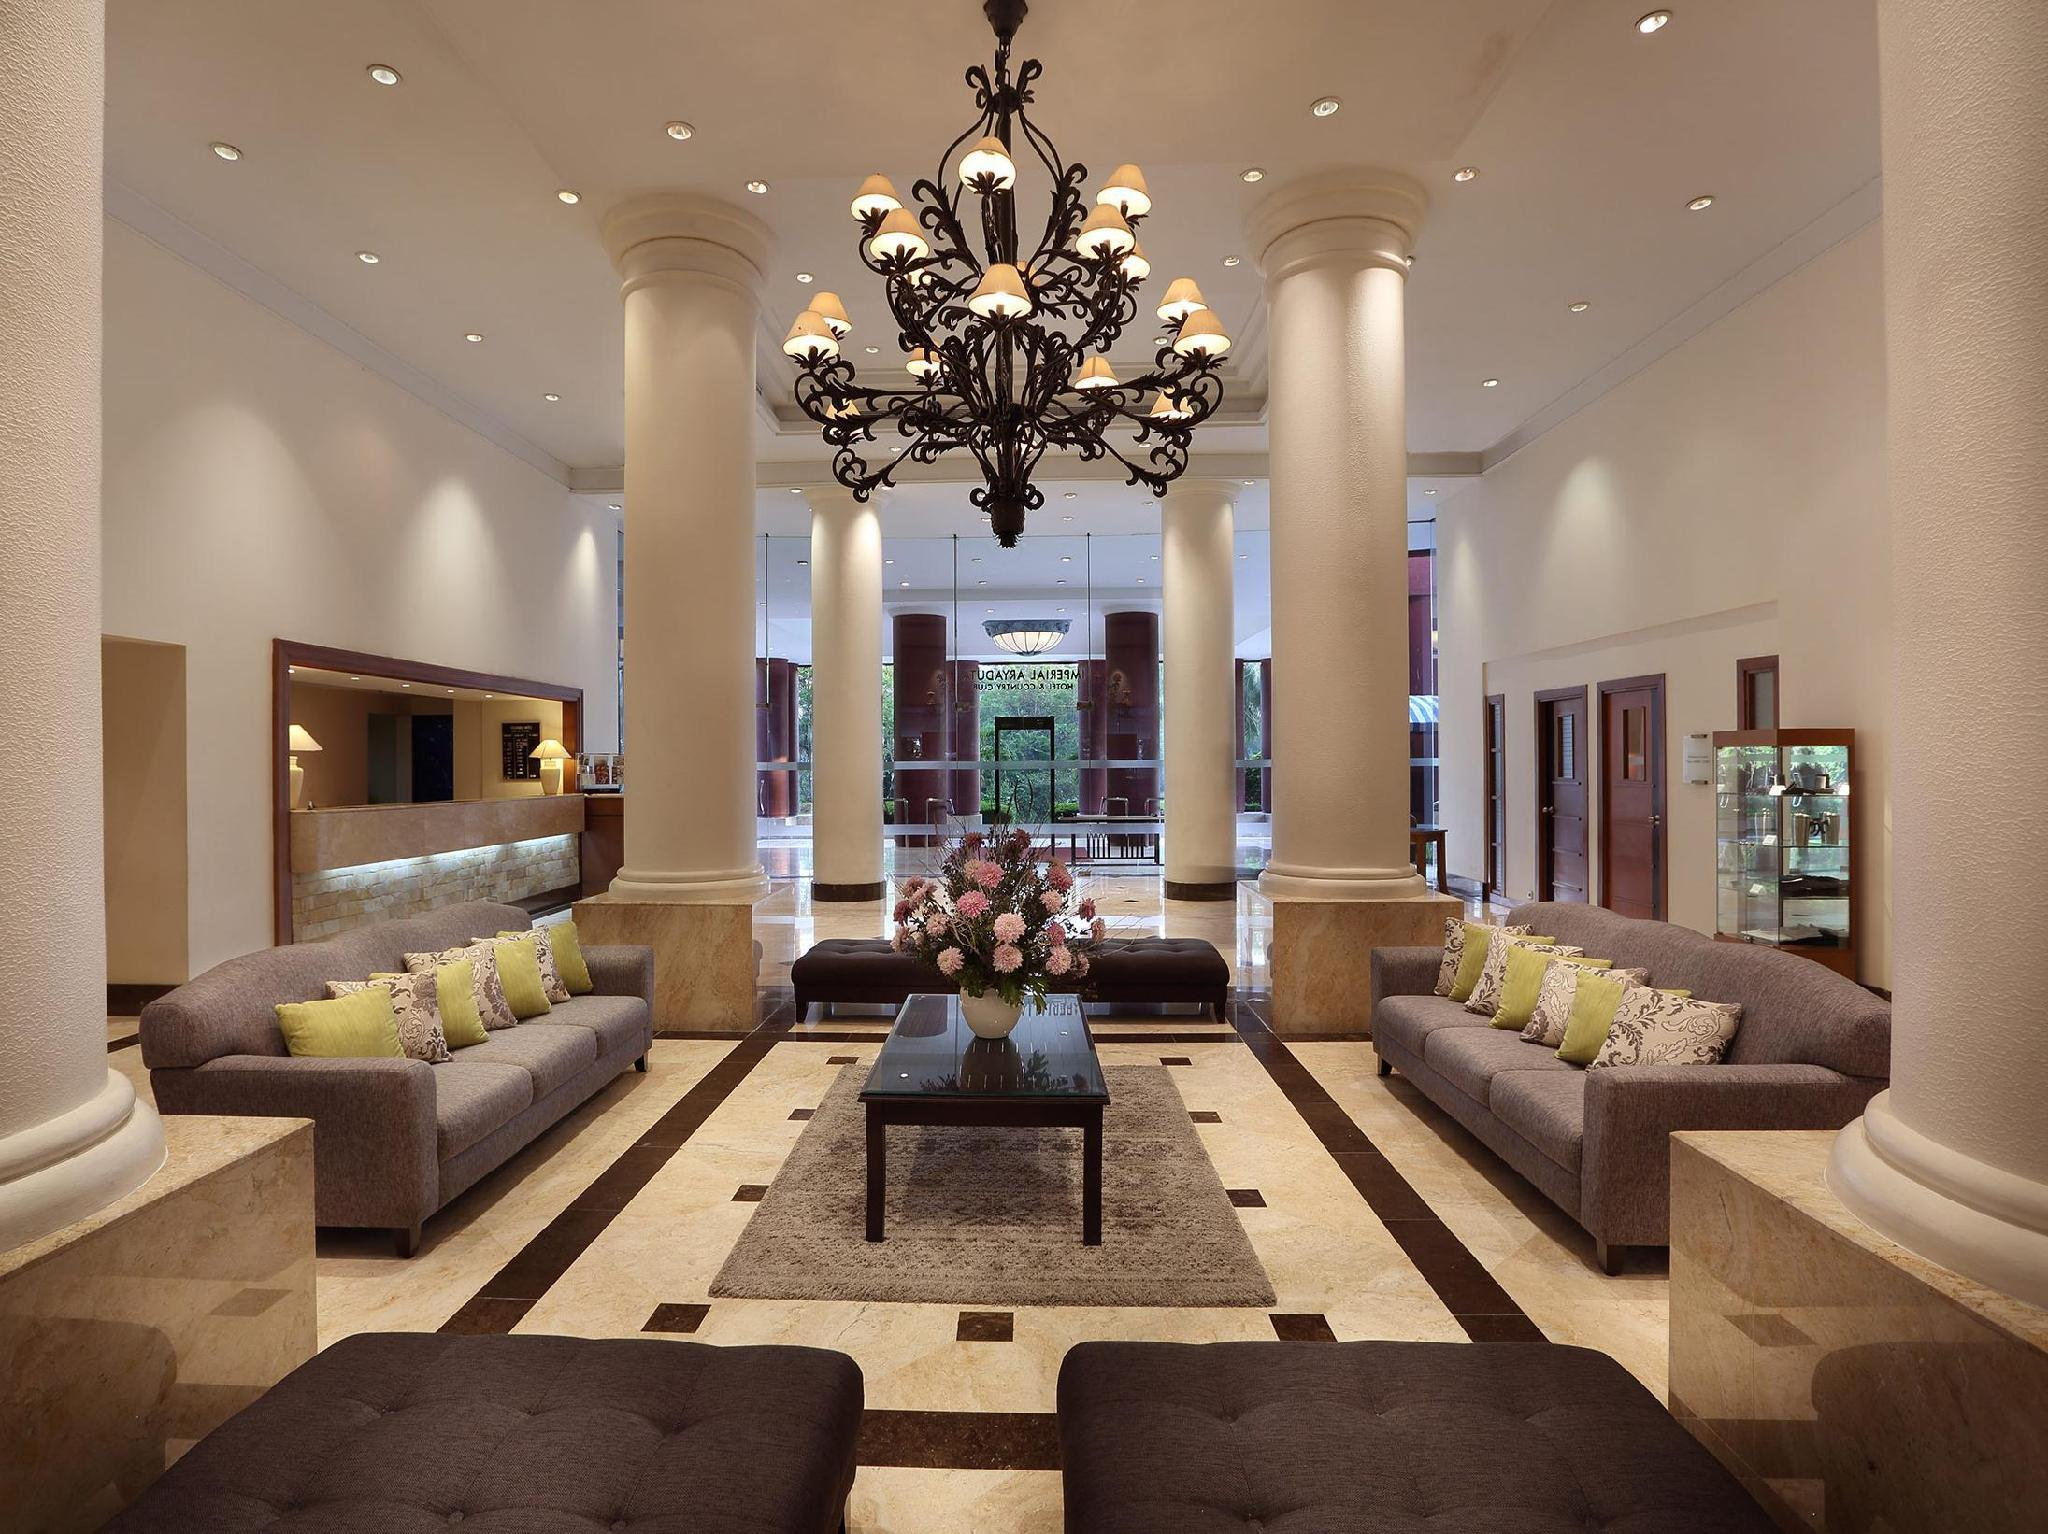 living room cafe bsd on vaporbullfl com living room zagreb ilica on vaporbullfl com